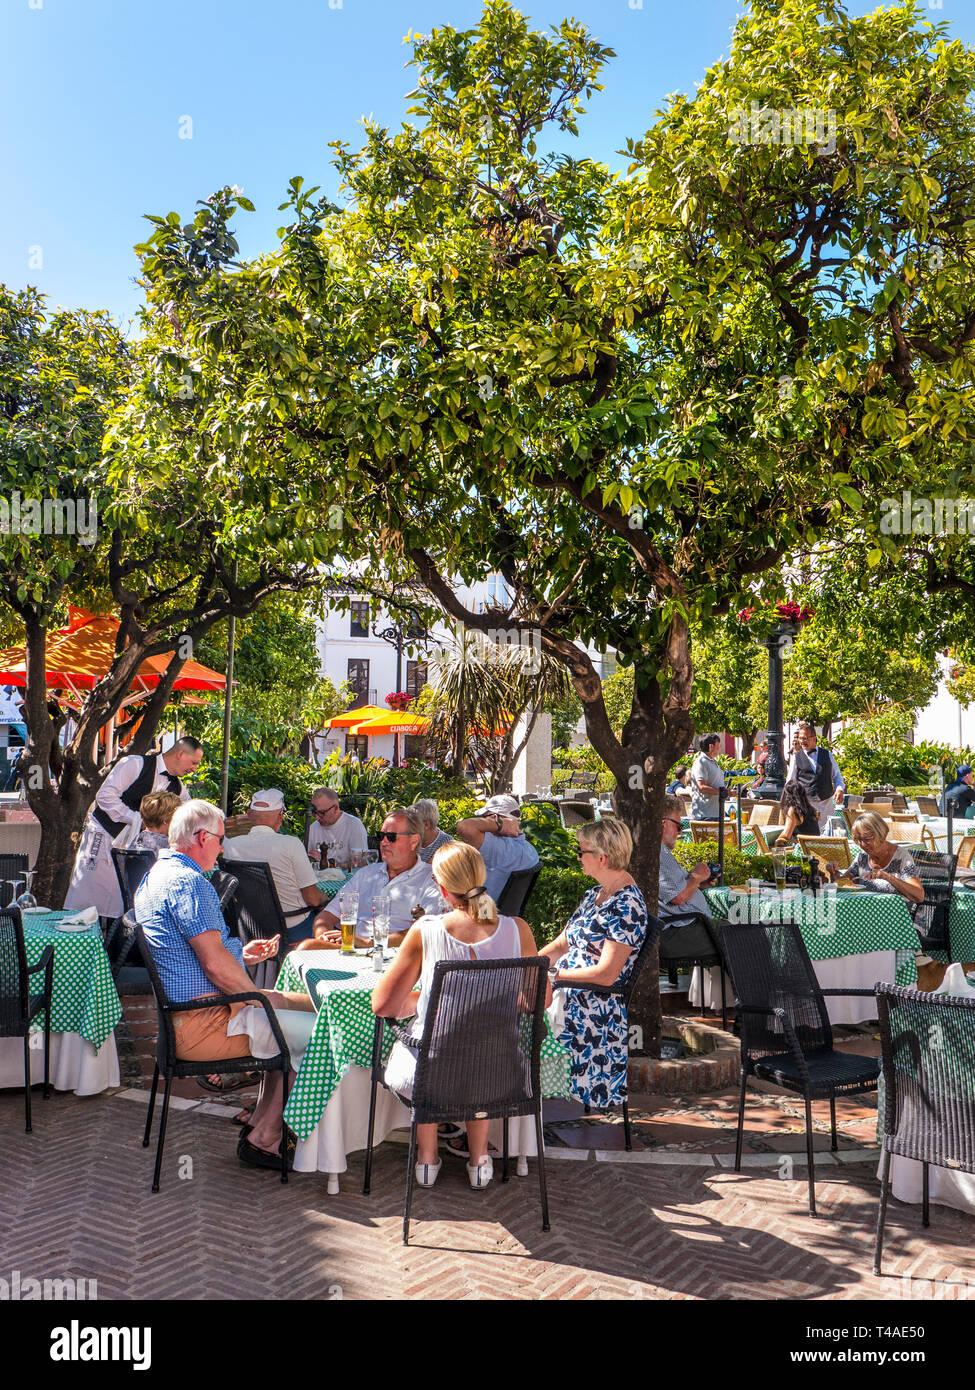 Alfresco dining Marbella Orange Square - Plaza de los Naranjos, Casco Antiguo. Outdoor dining, people enjoying food & wine in Old Town Marbella Spain - Stock Image